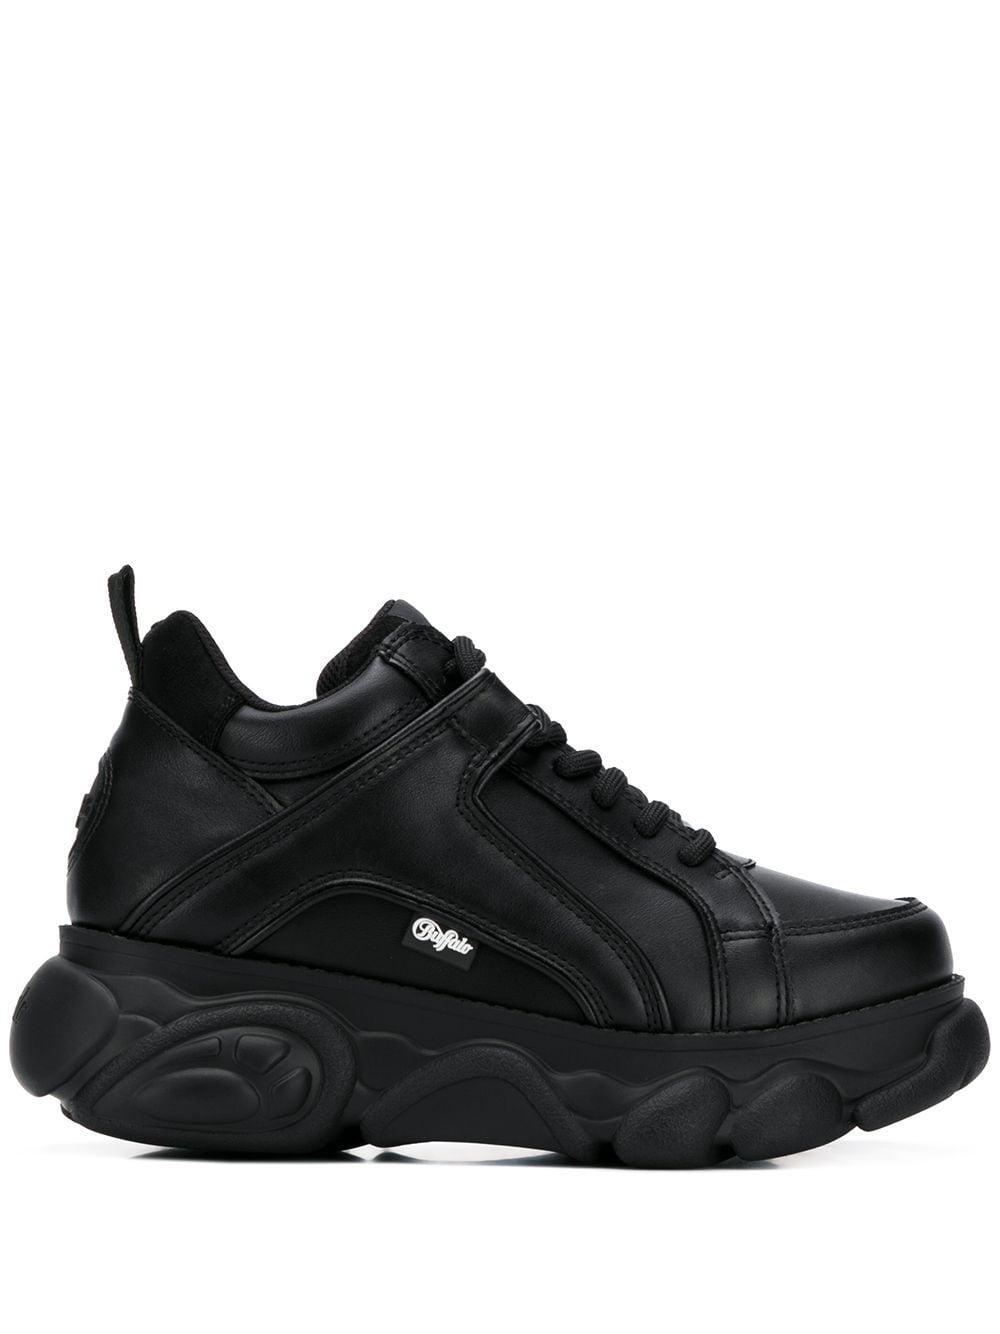 Buffalo Leather Corin Platform Sneakers